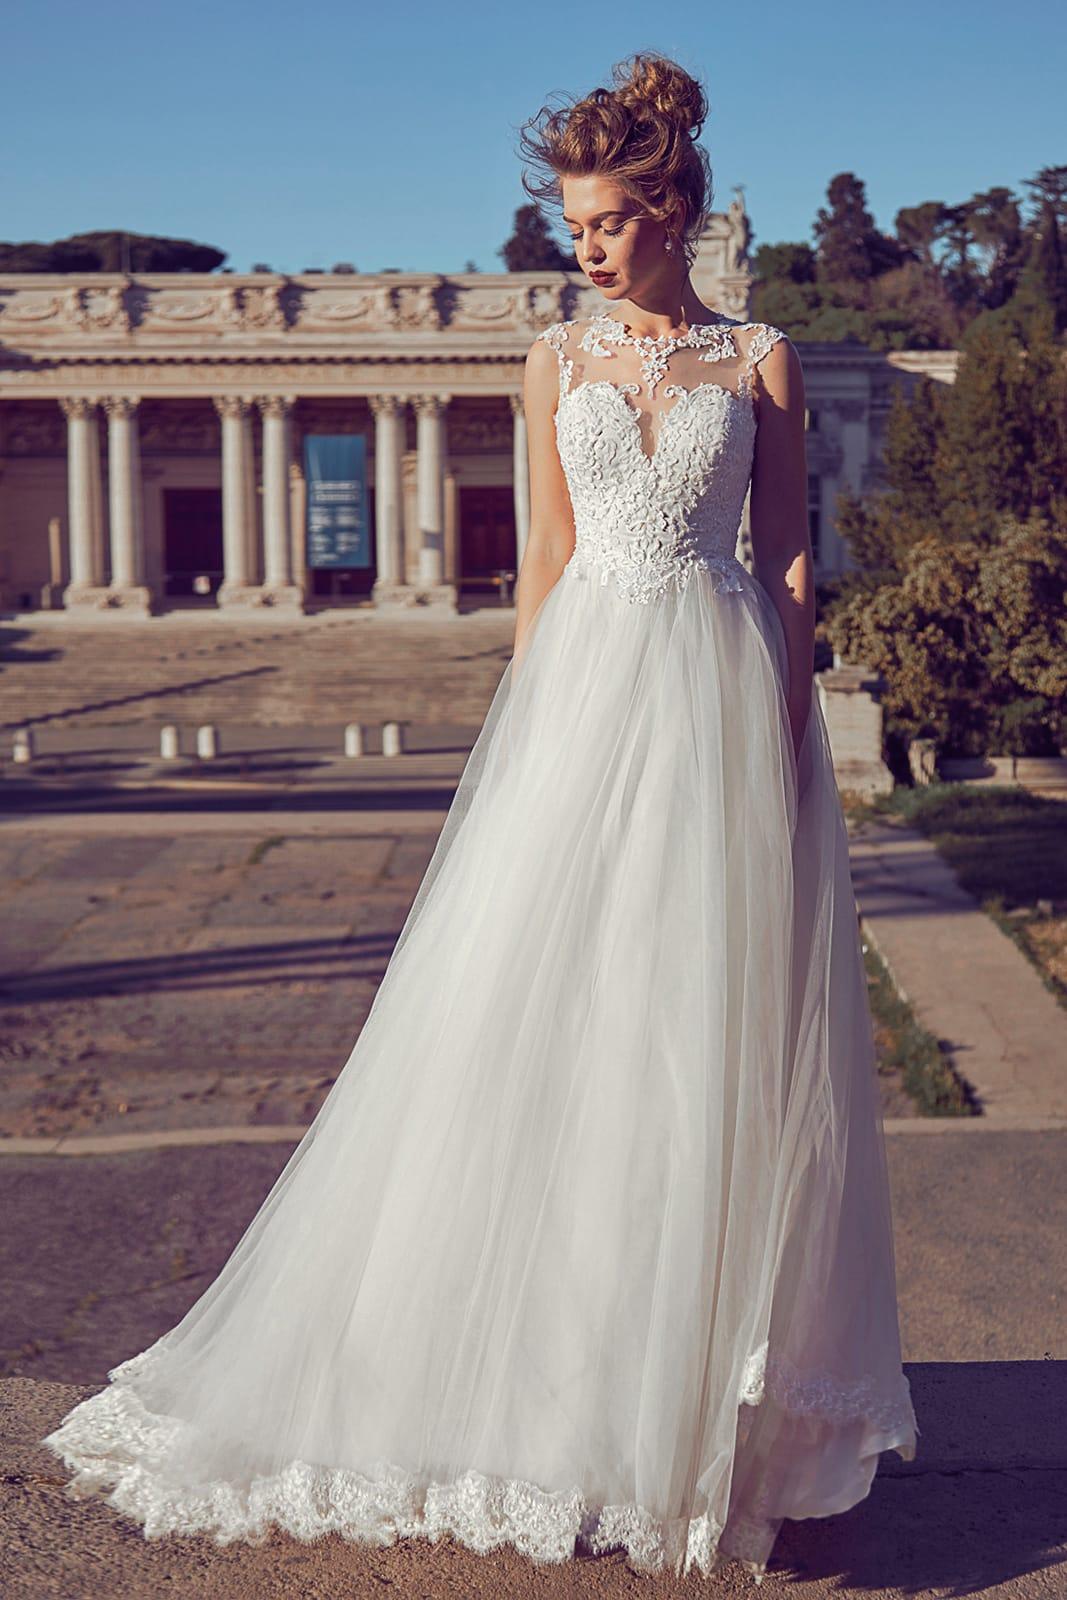 Natalie Model - Colectia Roma - Adora Sposa